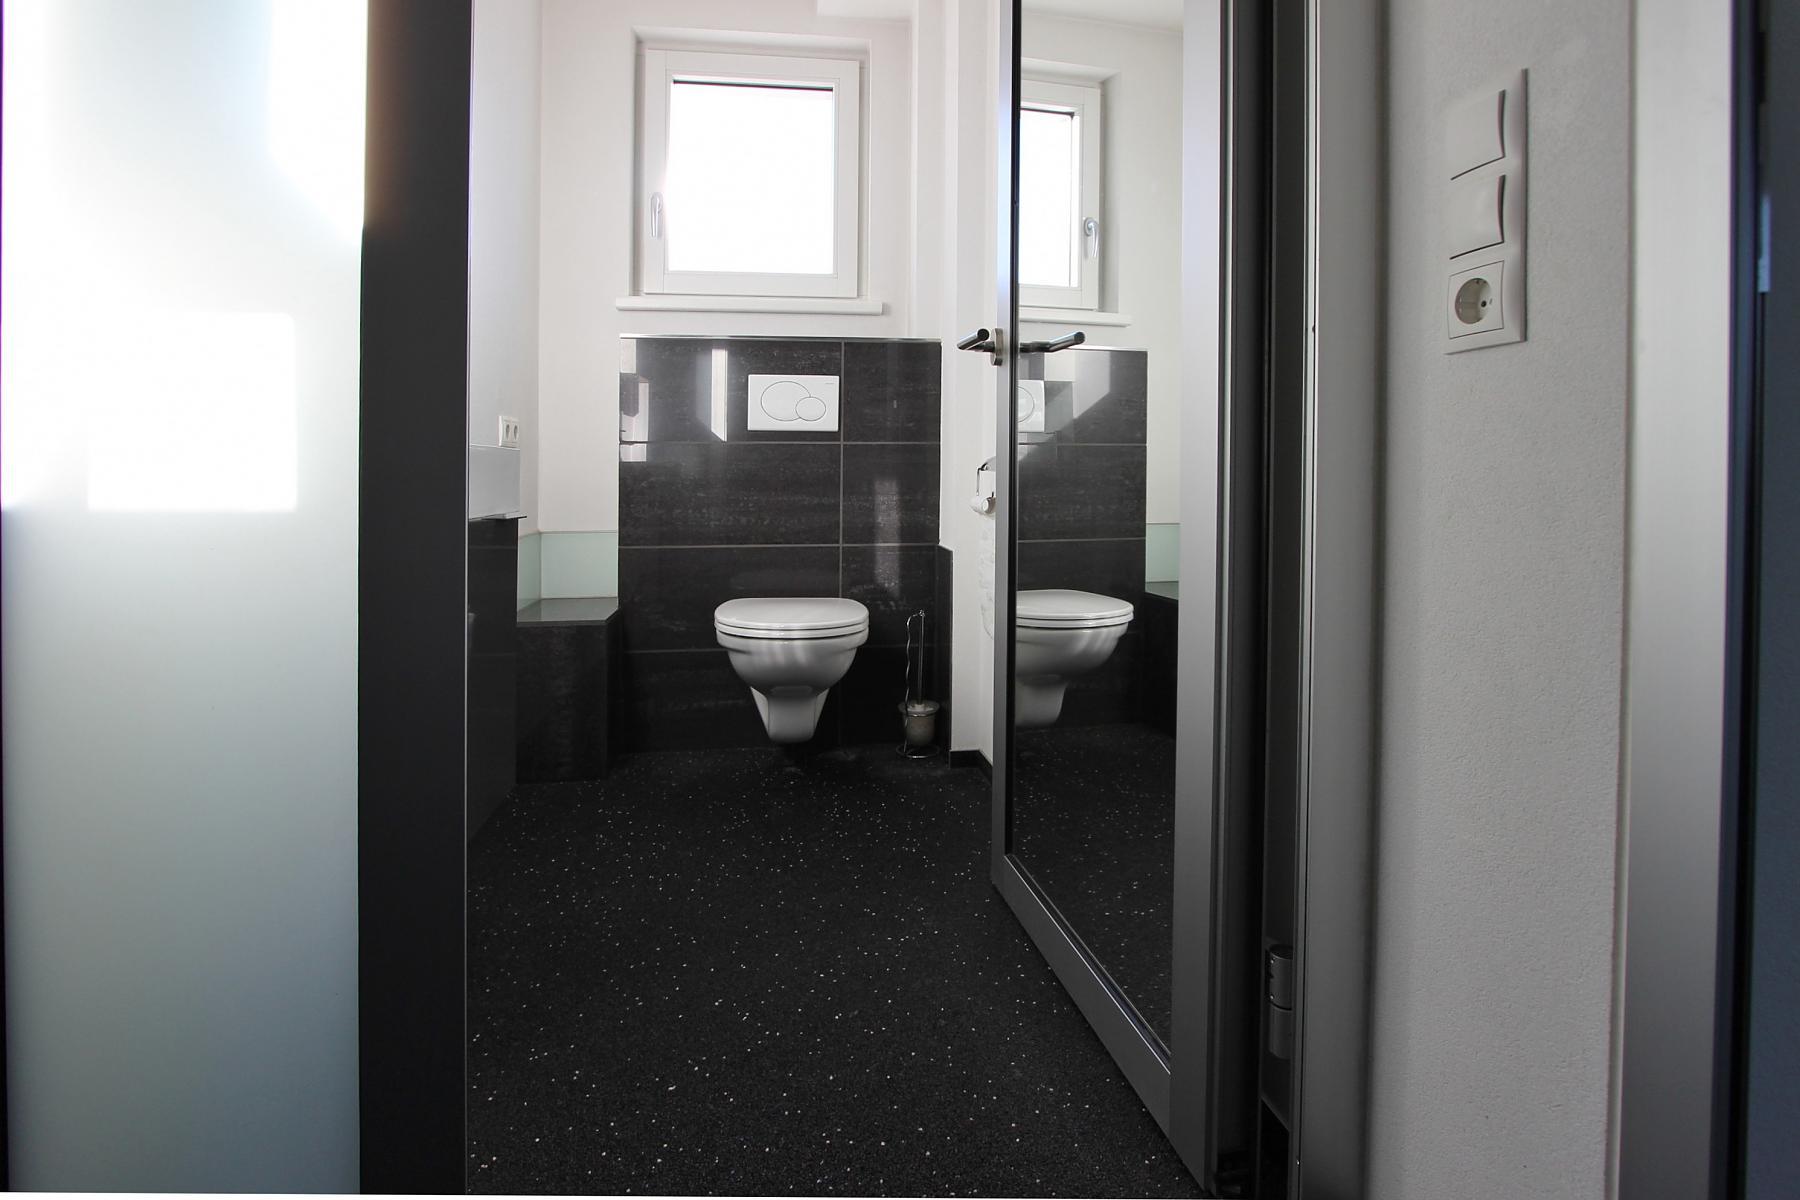 Immobilie ludesch 3 zimmer wohnung smart home for 3 zimmer wohnung